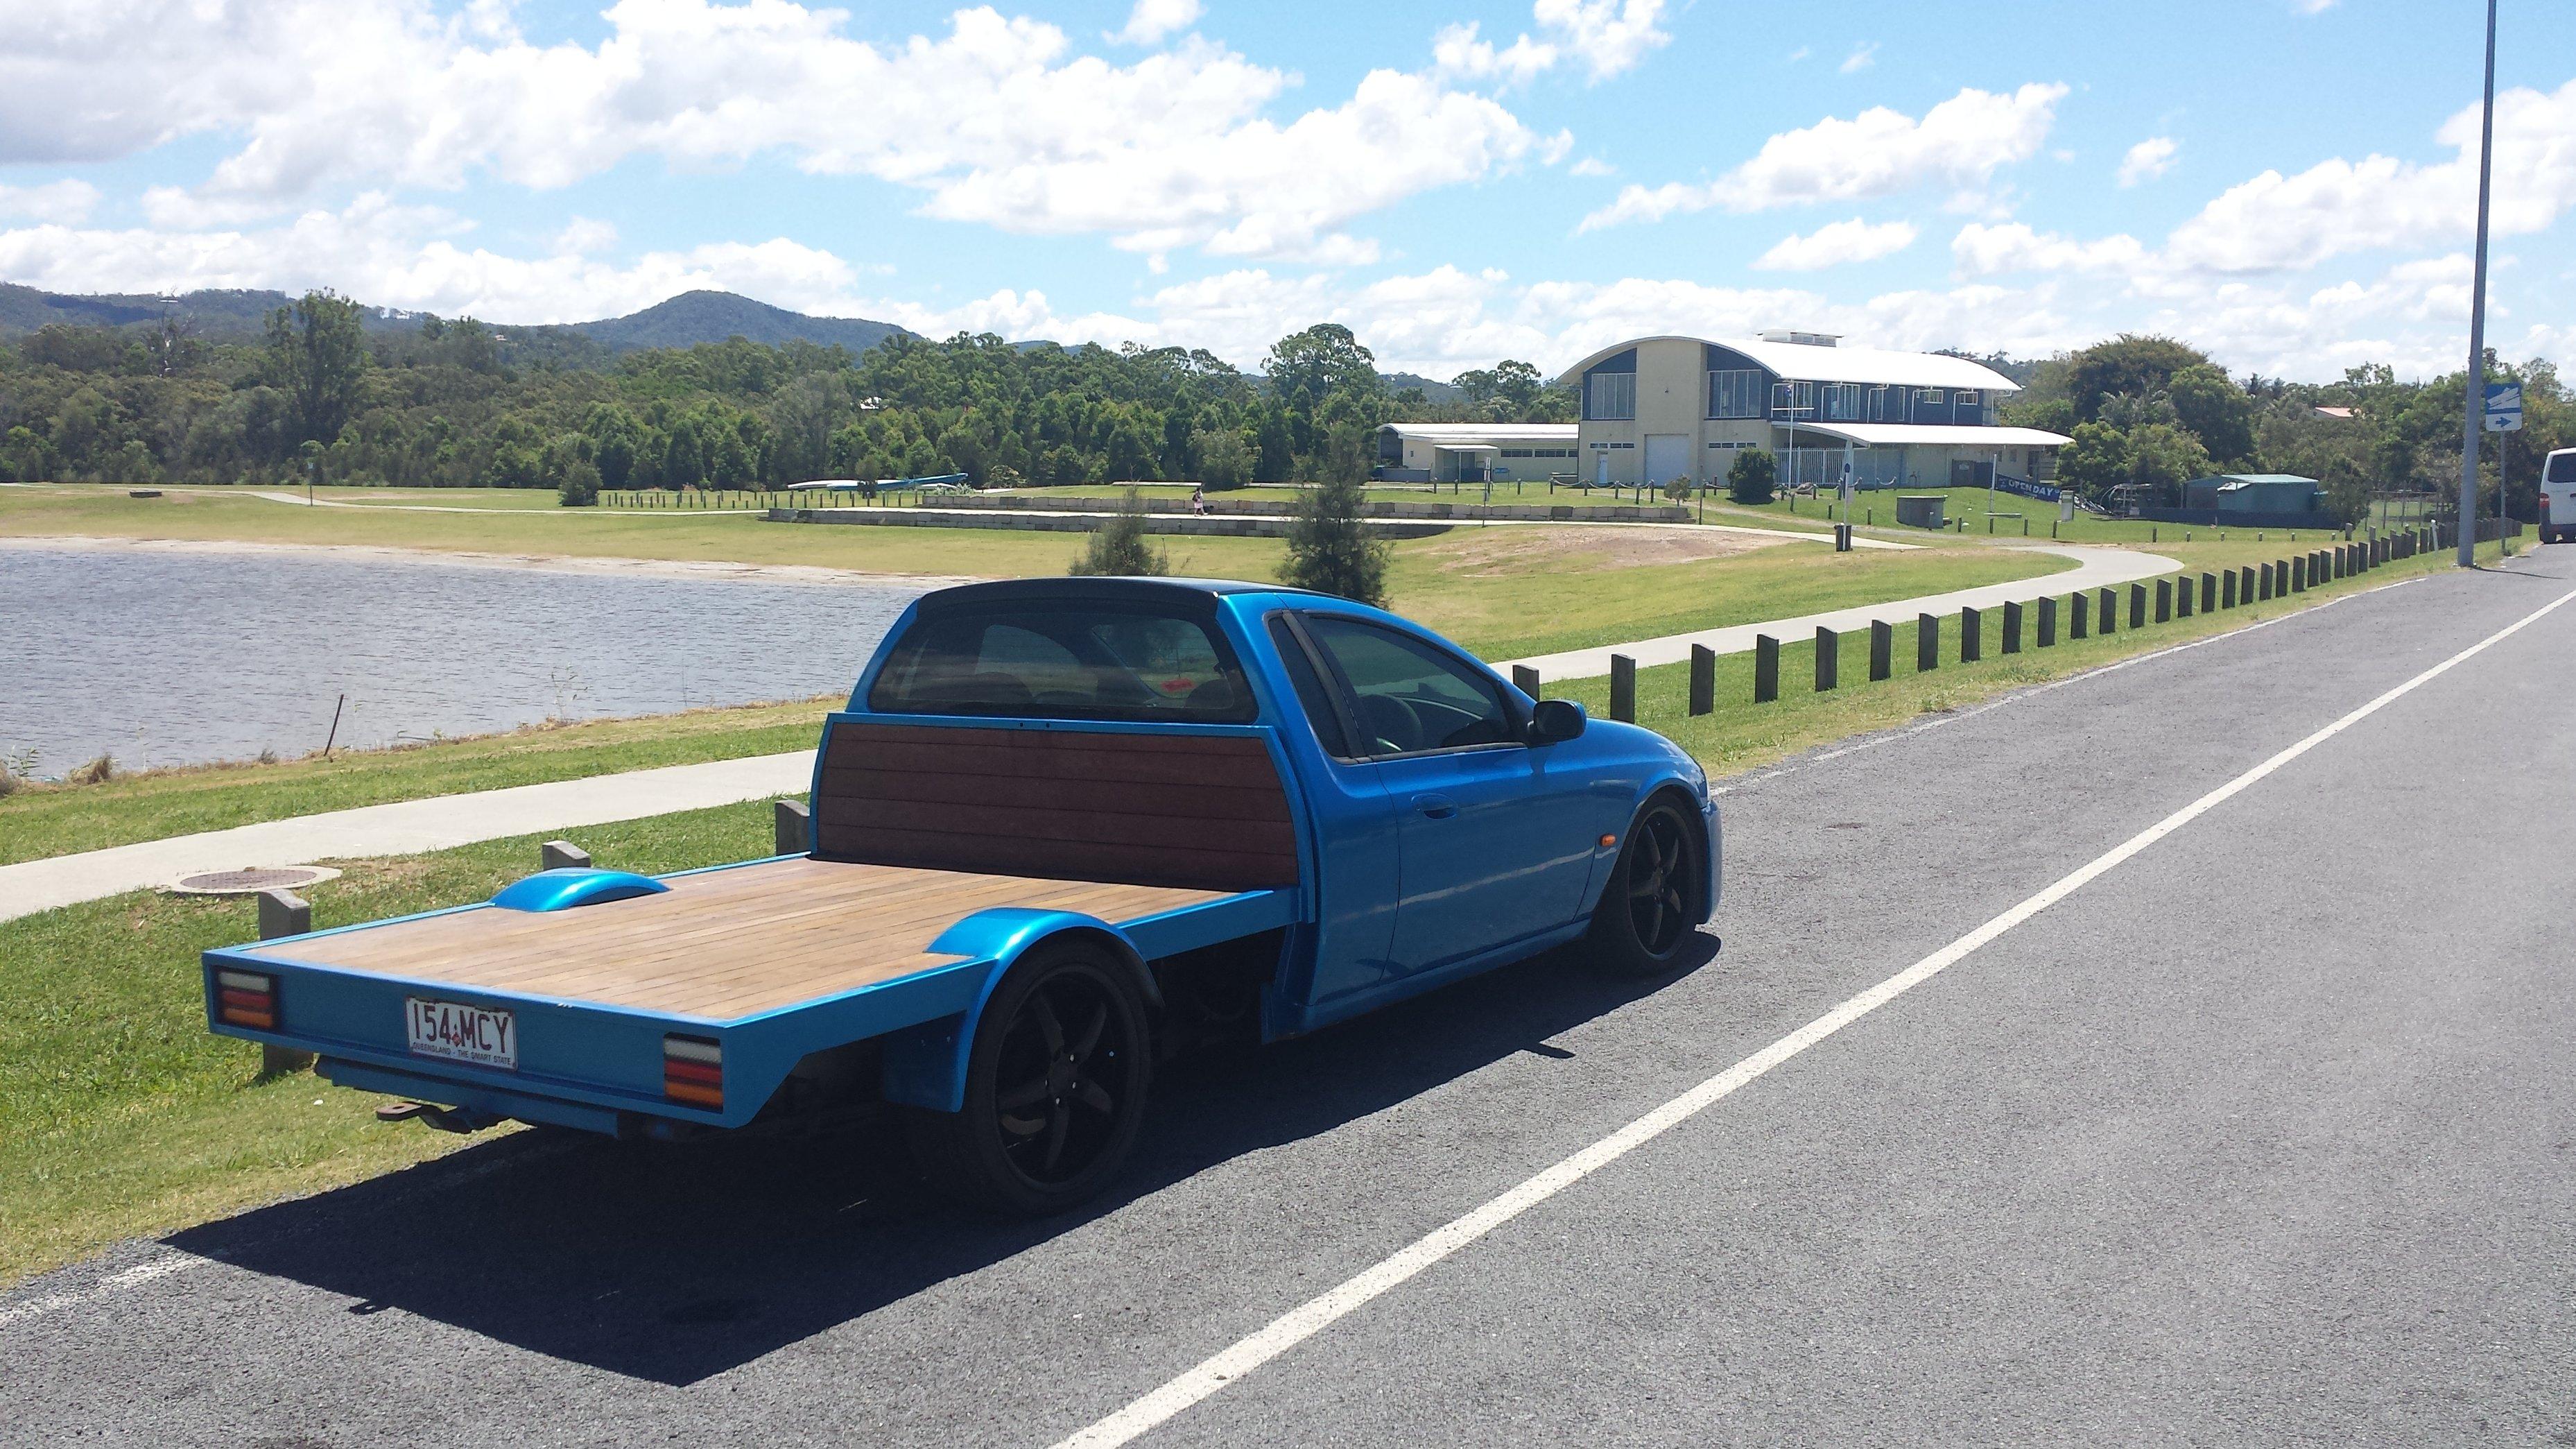 2013 Toyota Rav4 For Sale >> 1999 Ford Falcon Ute   Car Sales QLD: Brisbane South #2630762